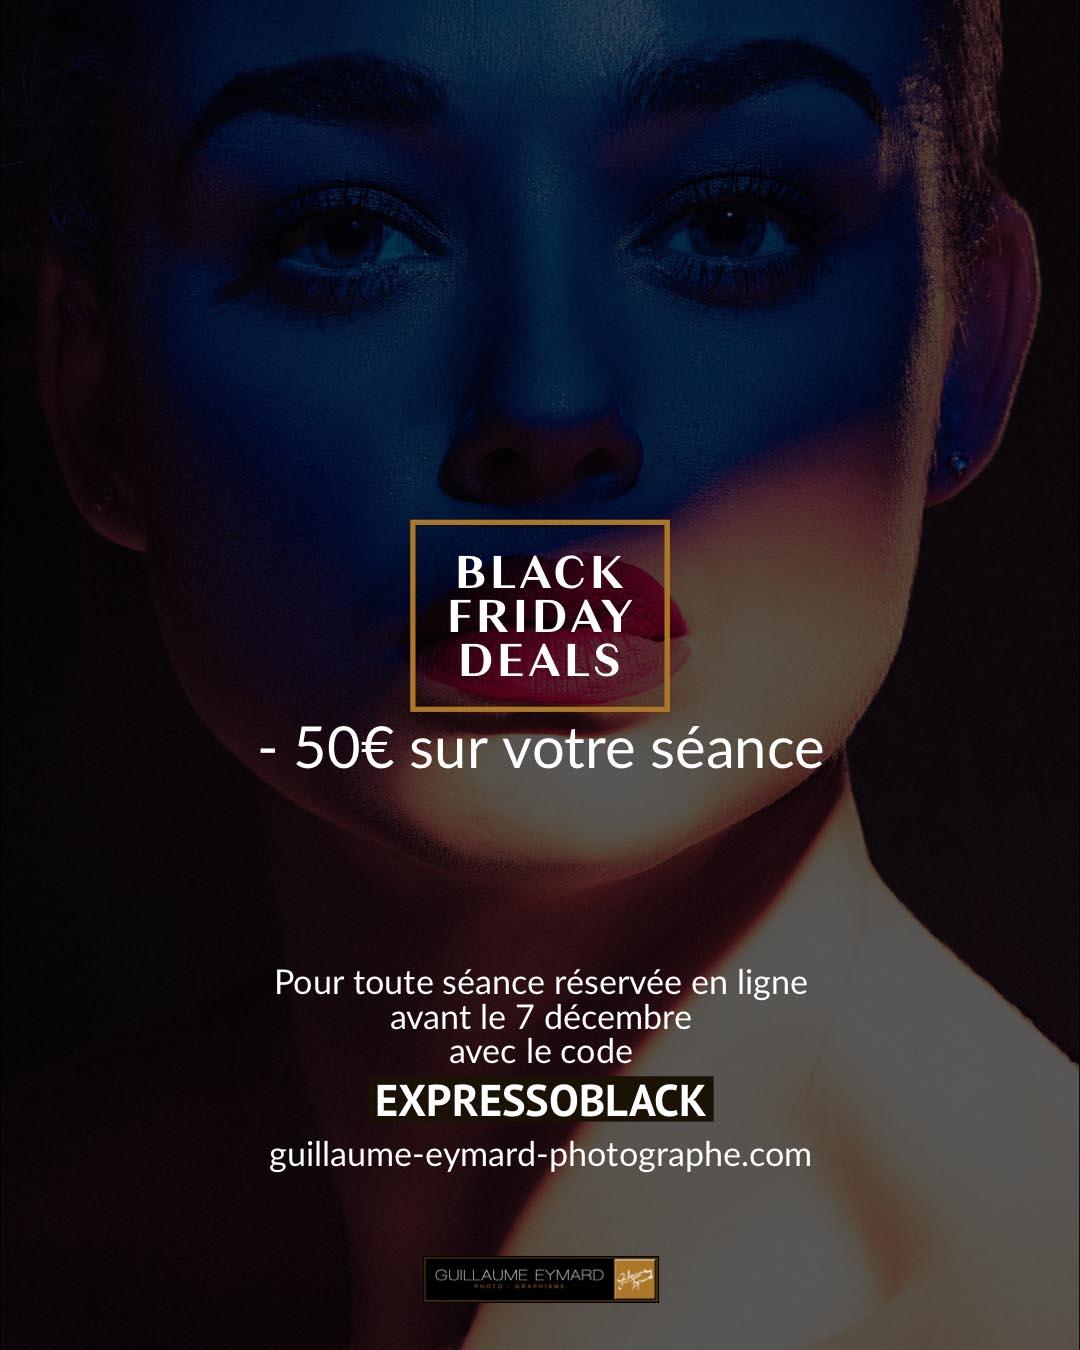 Black Friday - Guillaume Eymard